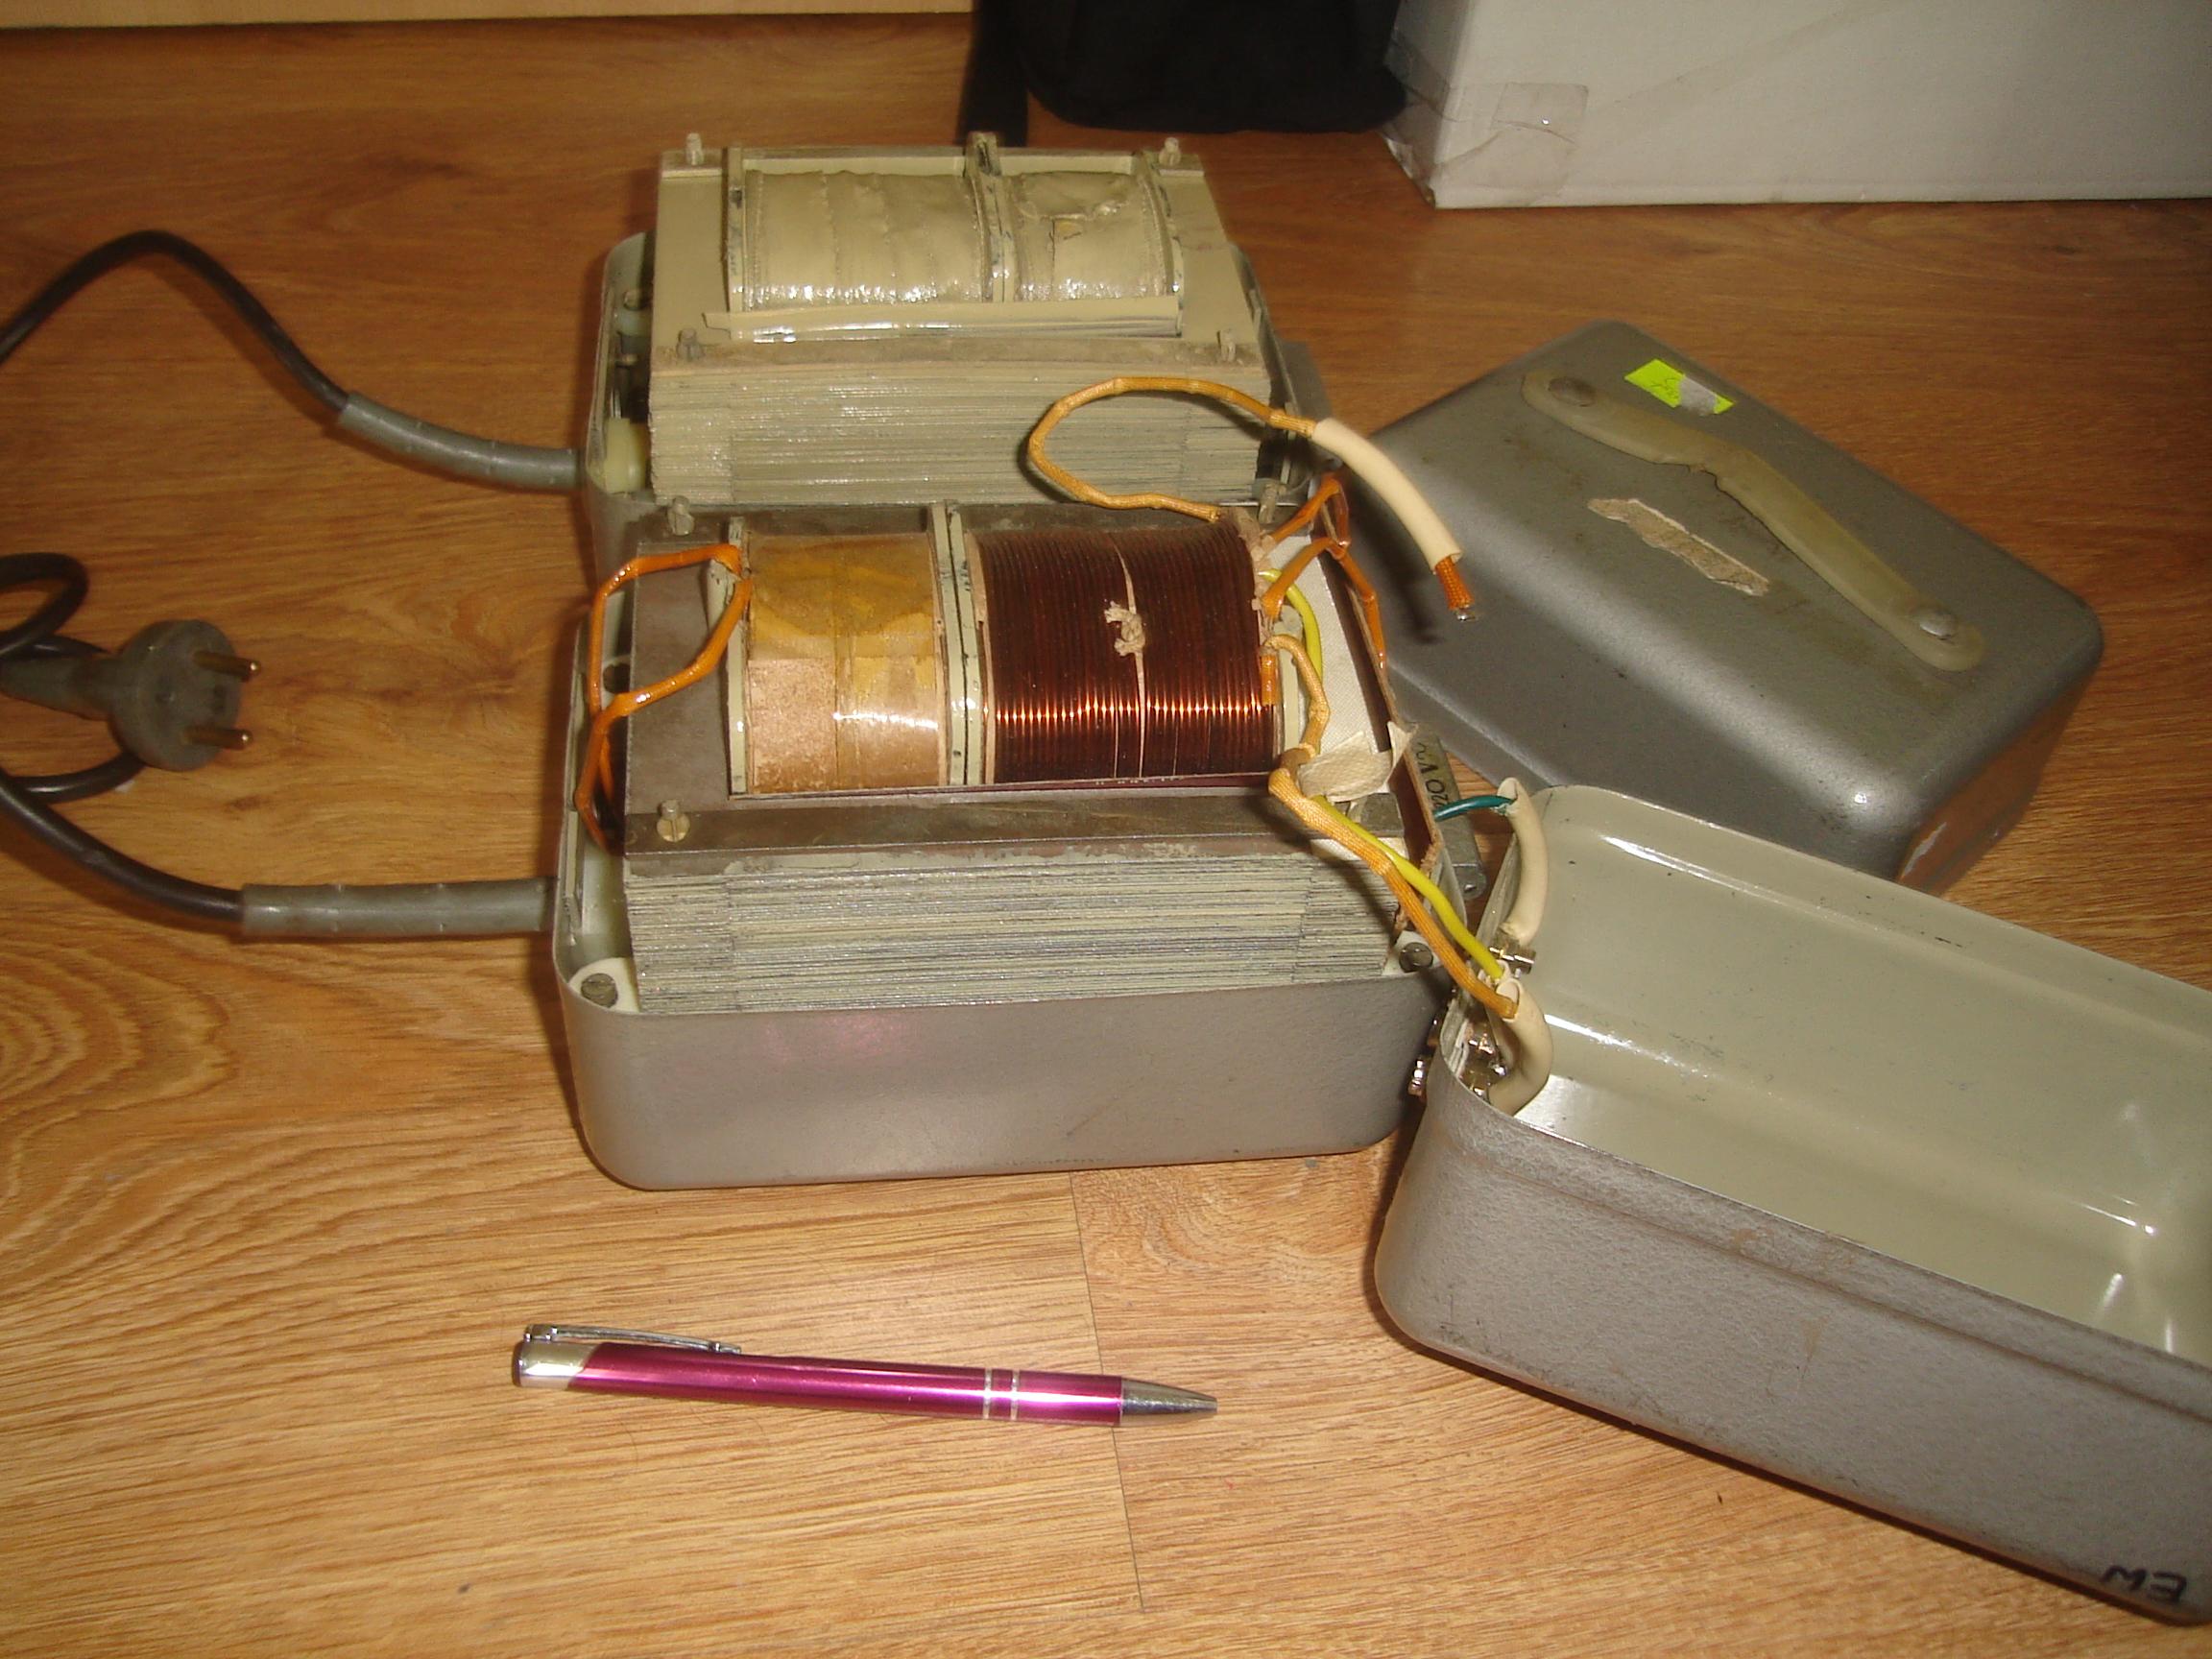 [Sprzedam] transformatory 12v i 24V duzej mocy